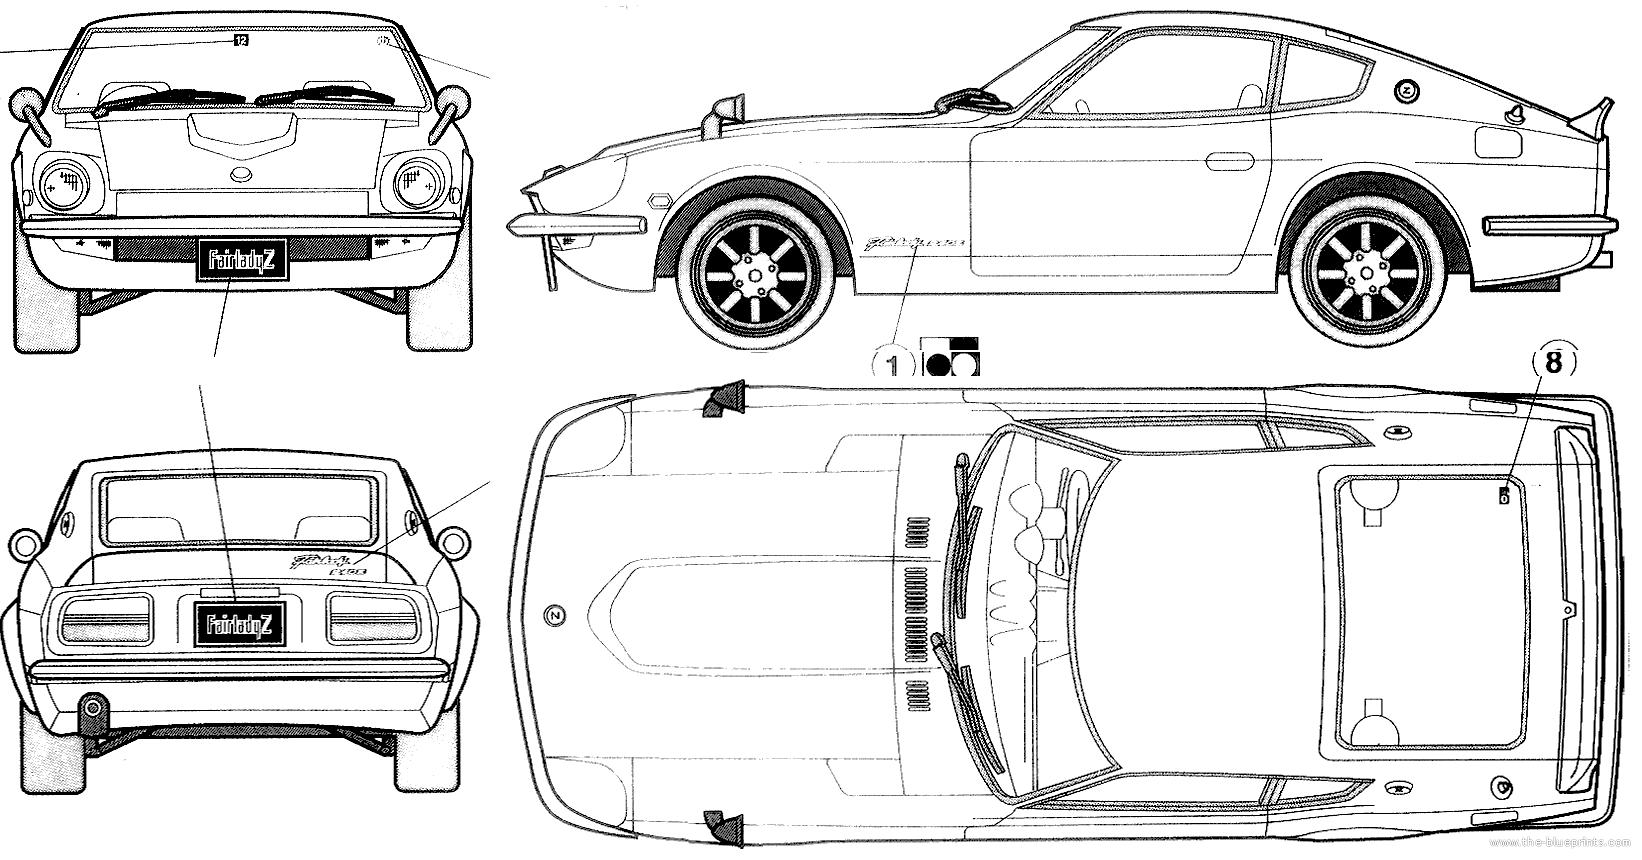 Blueprints > Cars > Datsun > Datsun 240Z (1972)